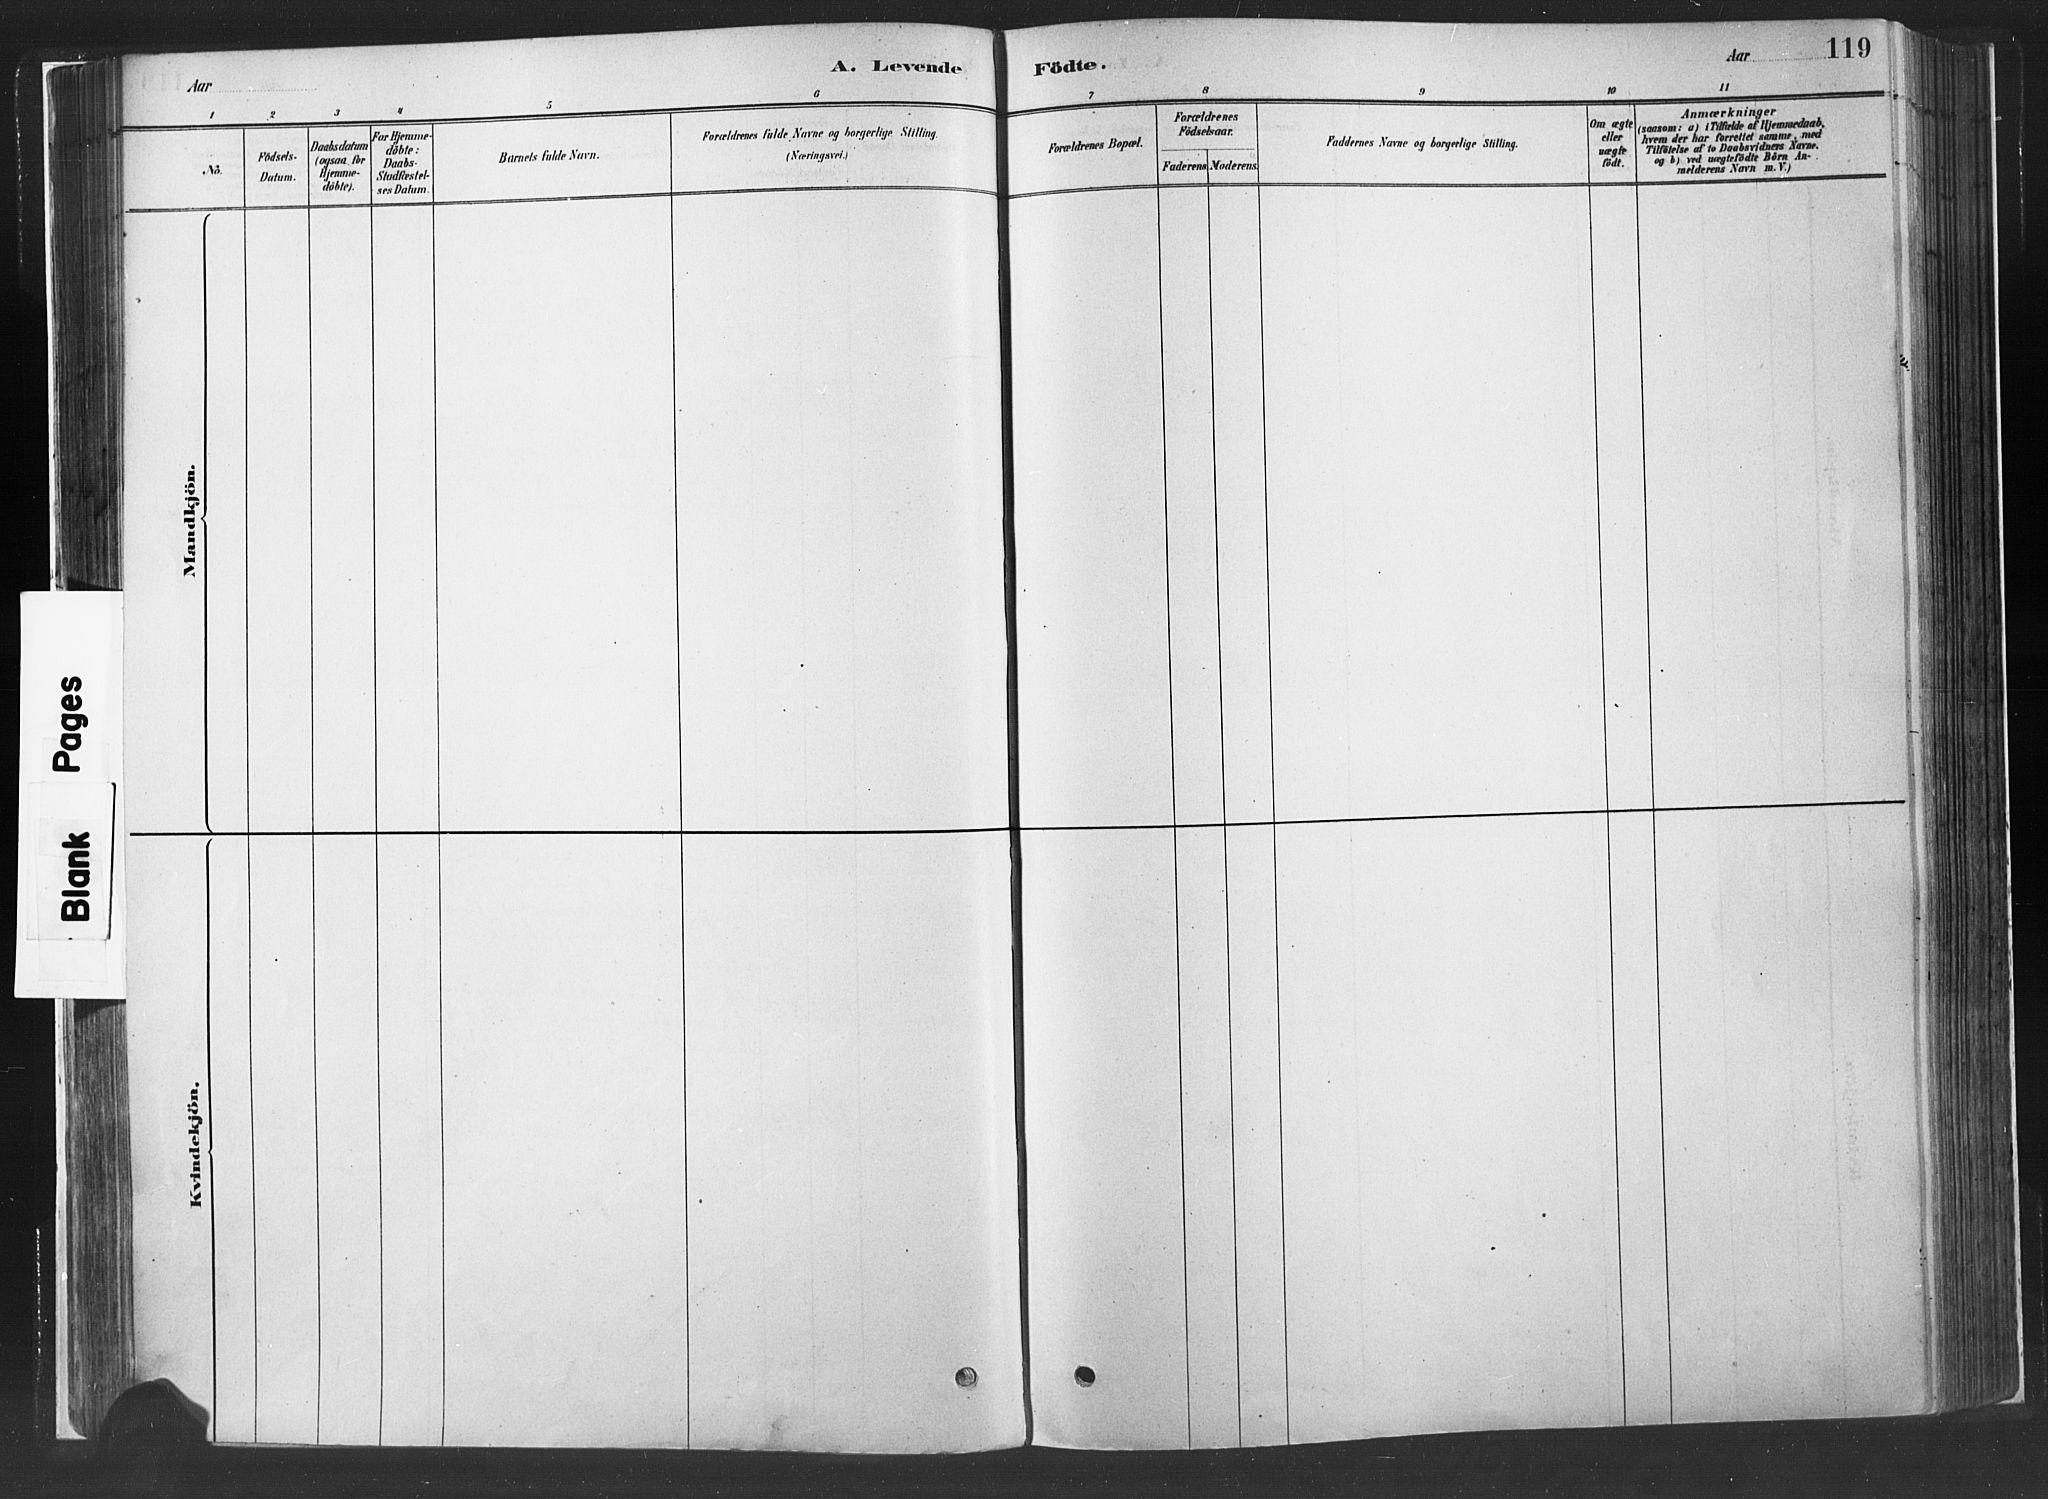 SAH, Fåberg prestekontor, H/Ha/Haa/L0010: Ministerialbok nr. 10, 1879-1900, s. 119